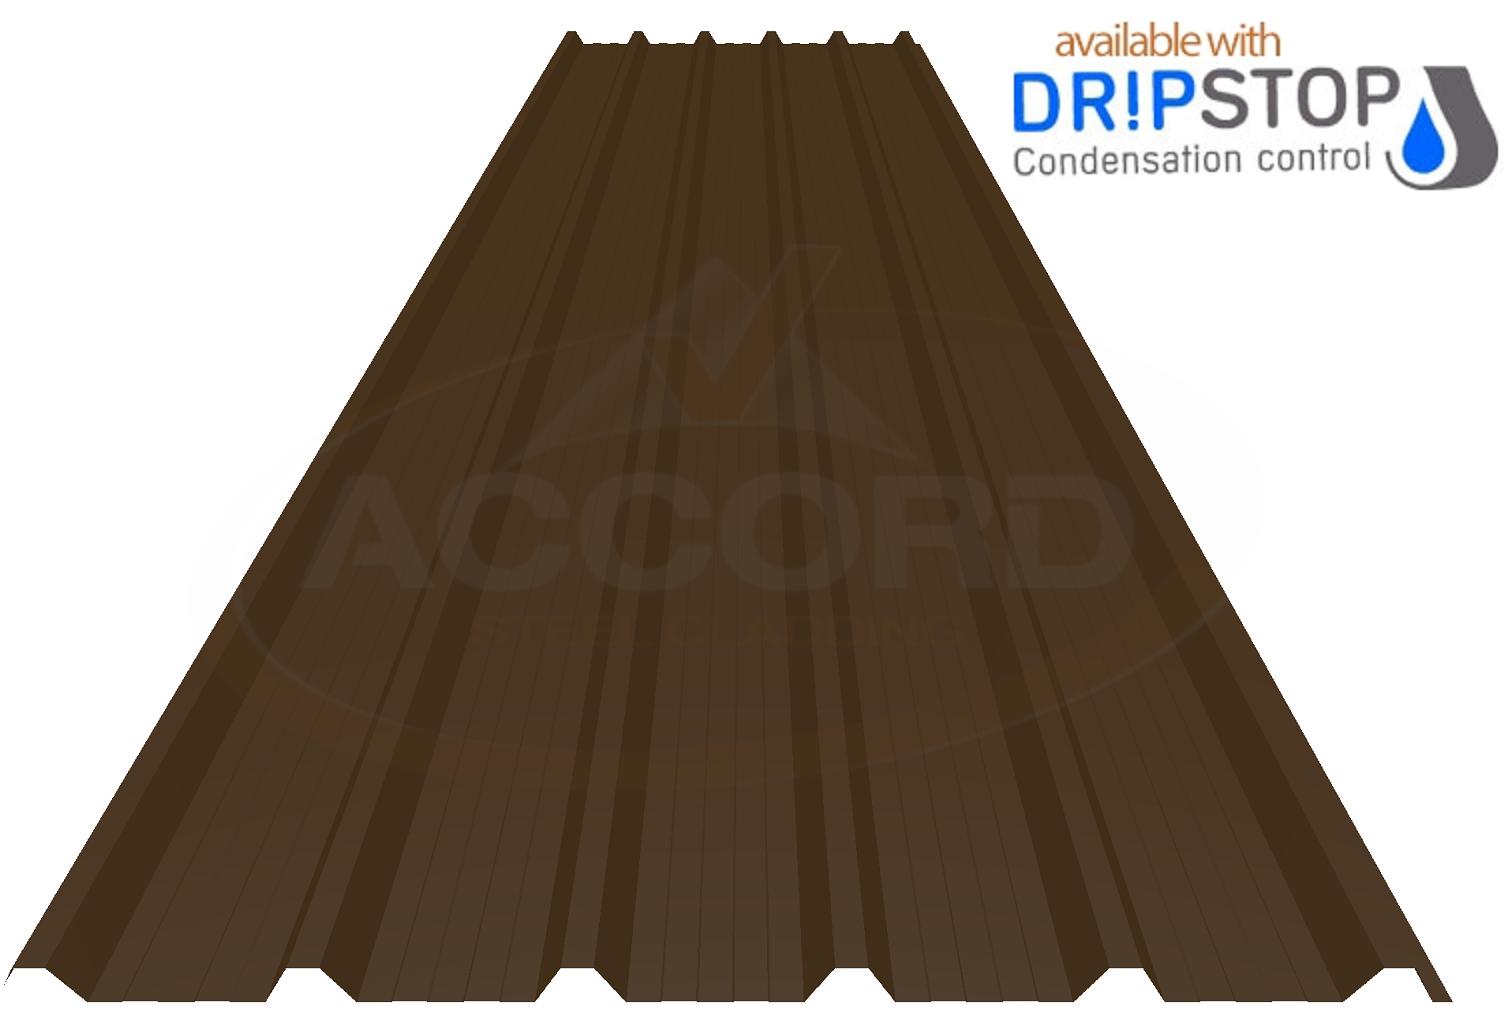 Slate Dark Grey Box Profile Corrugated Metal Steel Roof Cladding Sheets